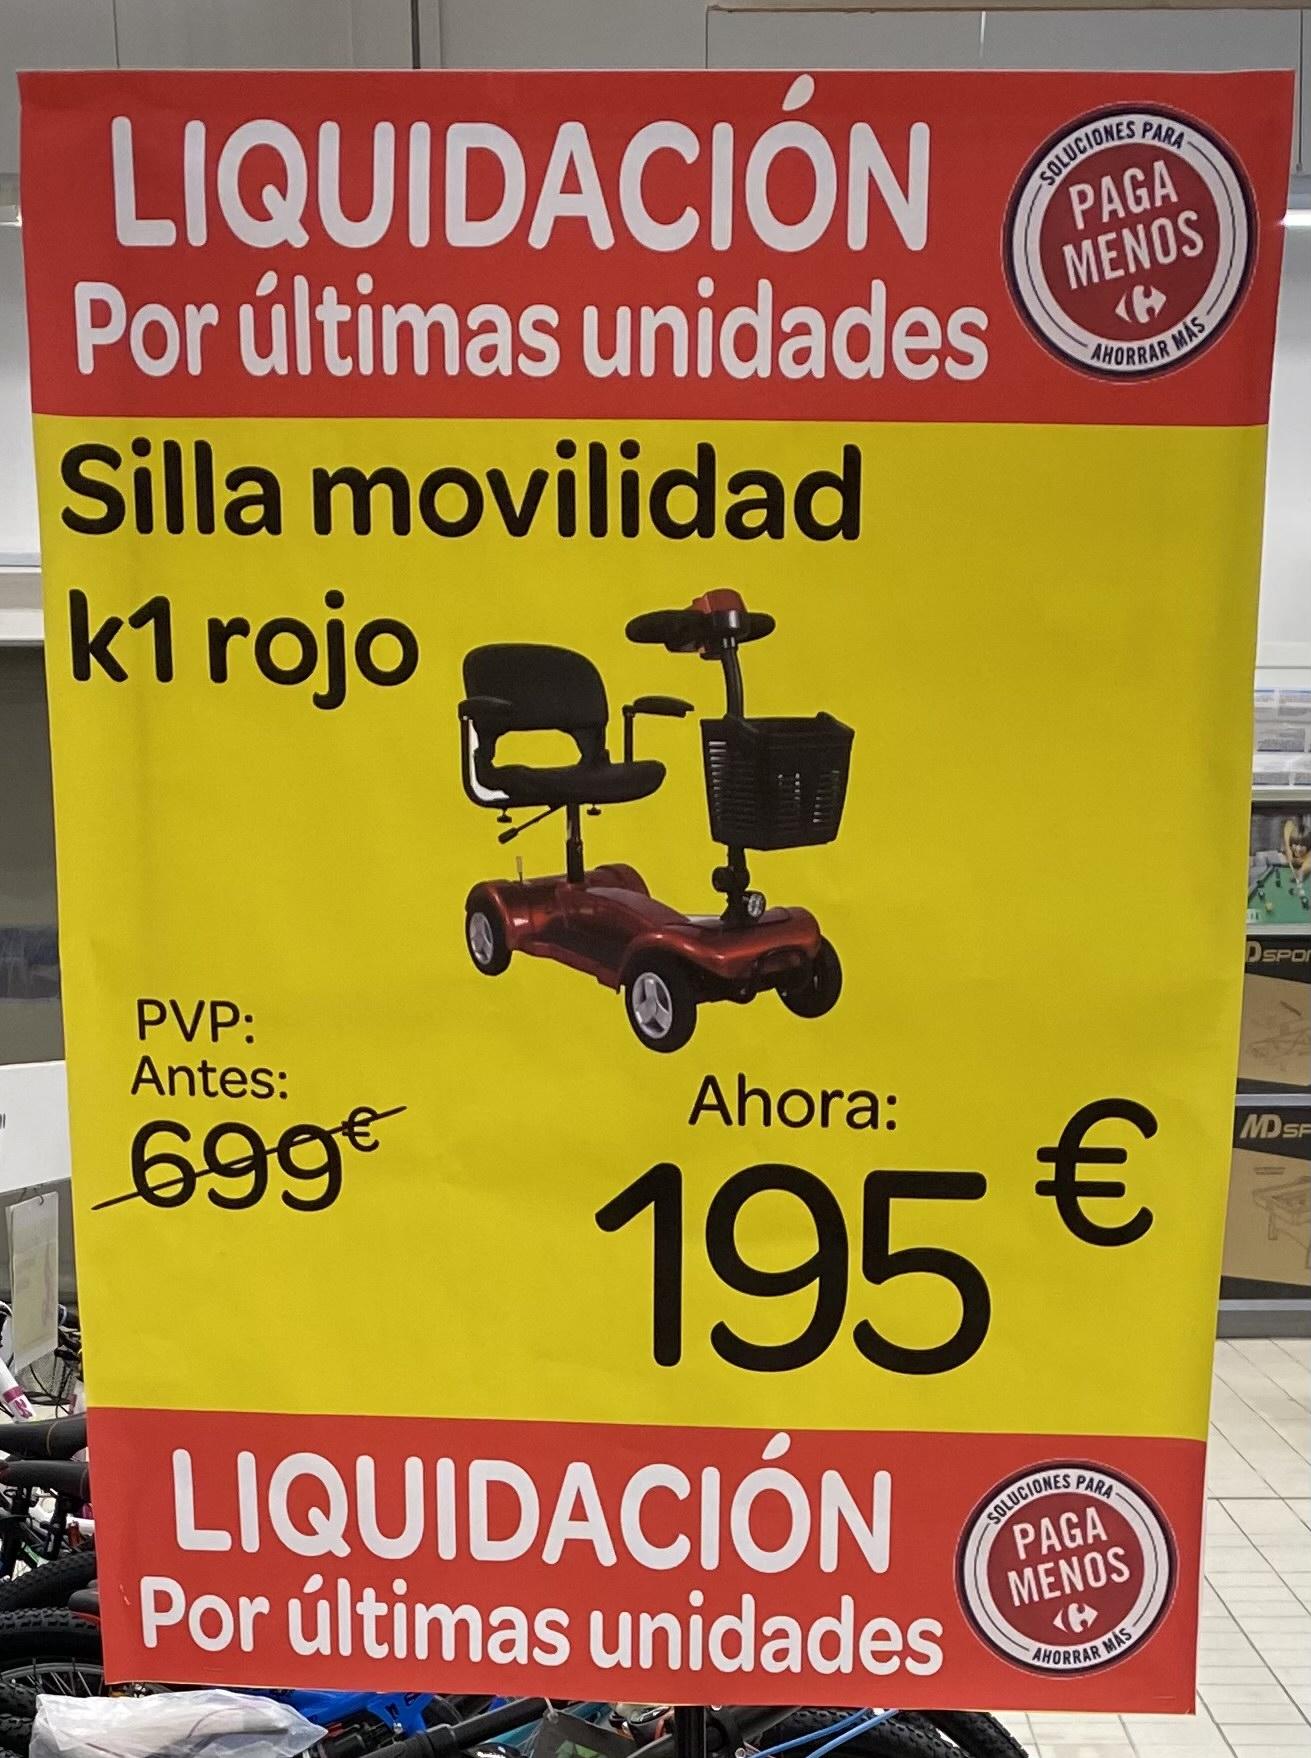 Silla movilidad K1 rojo (Carrefour Torrelavega )